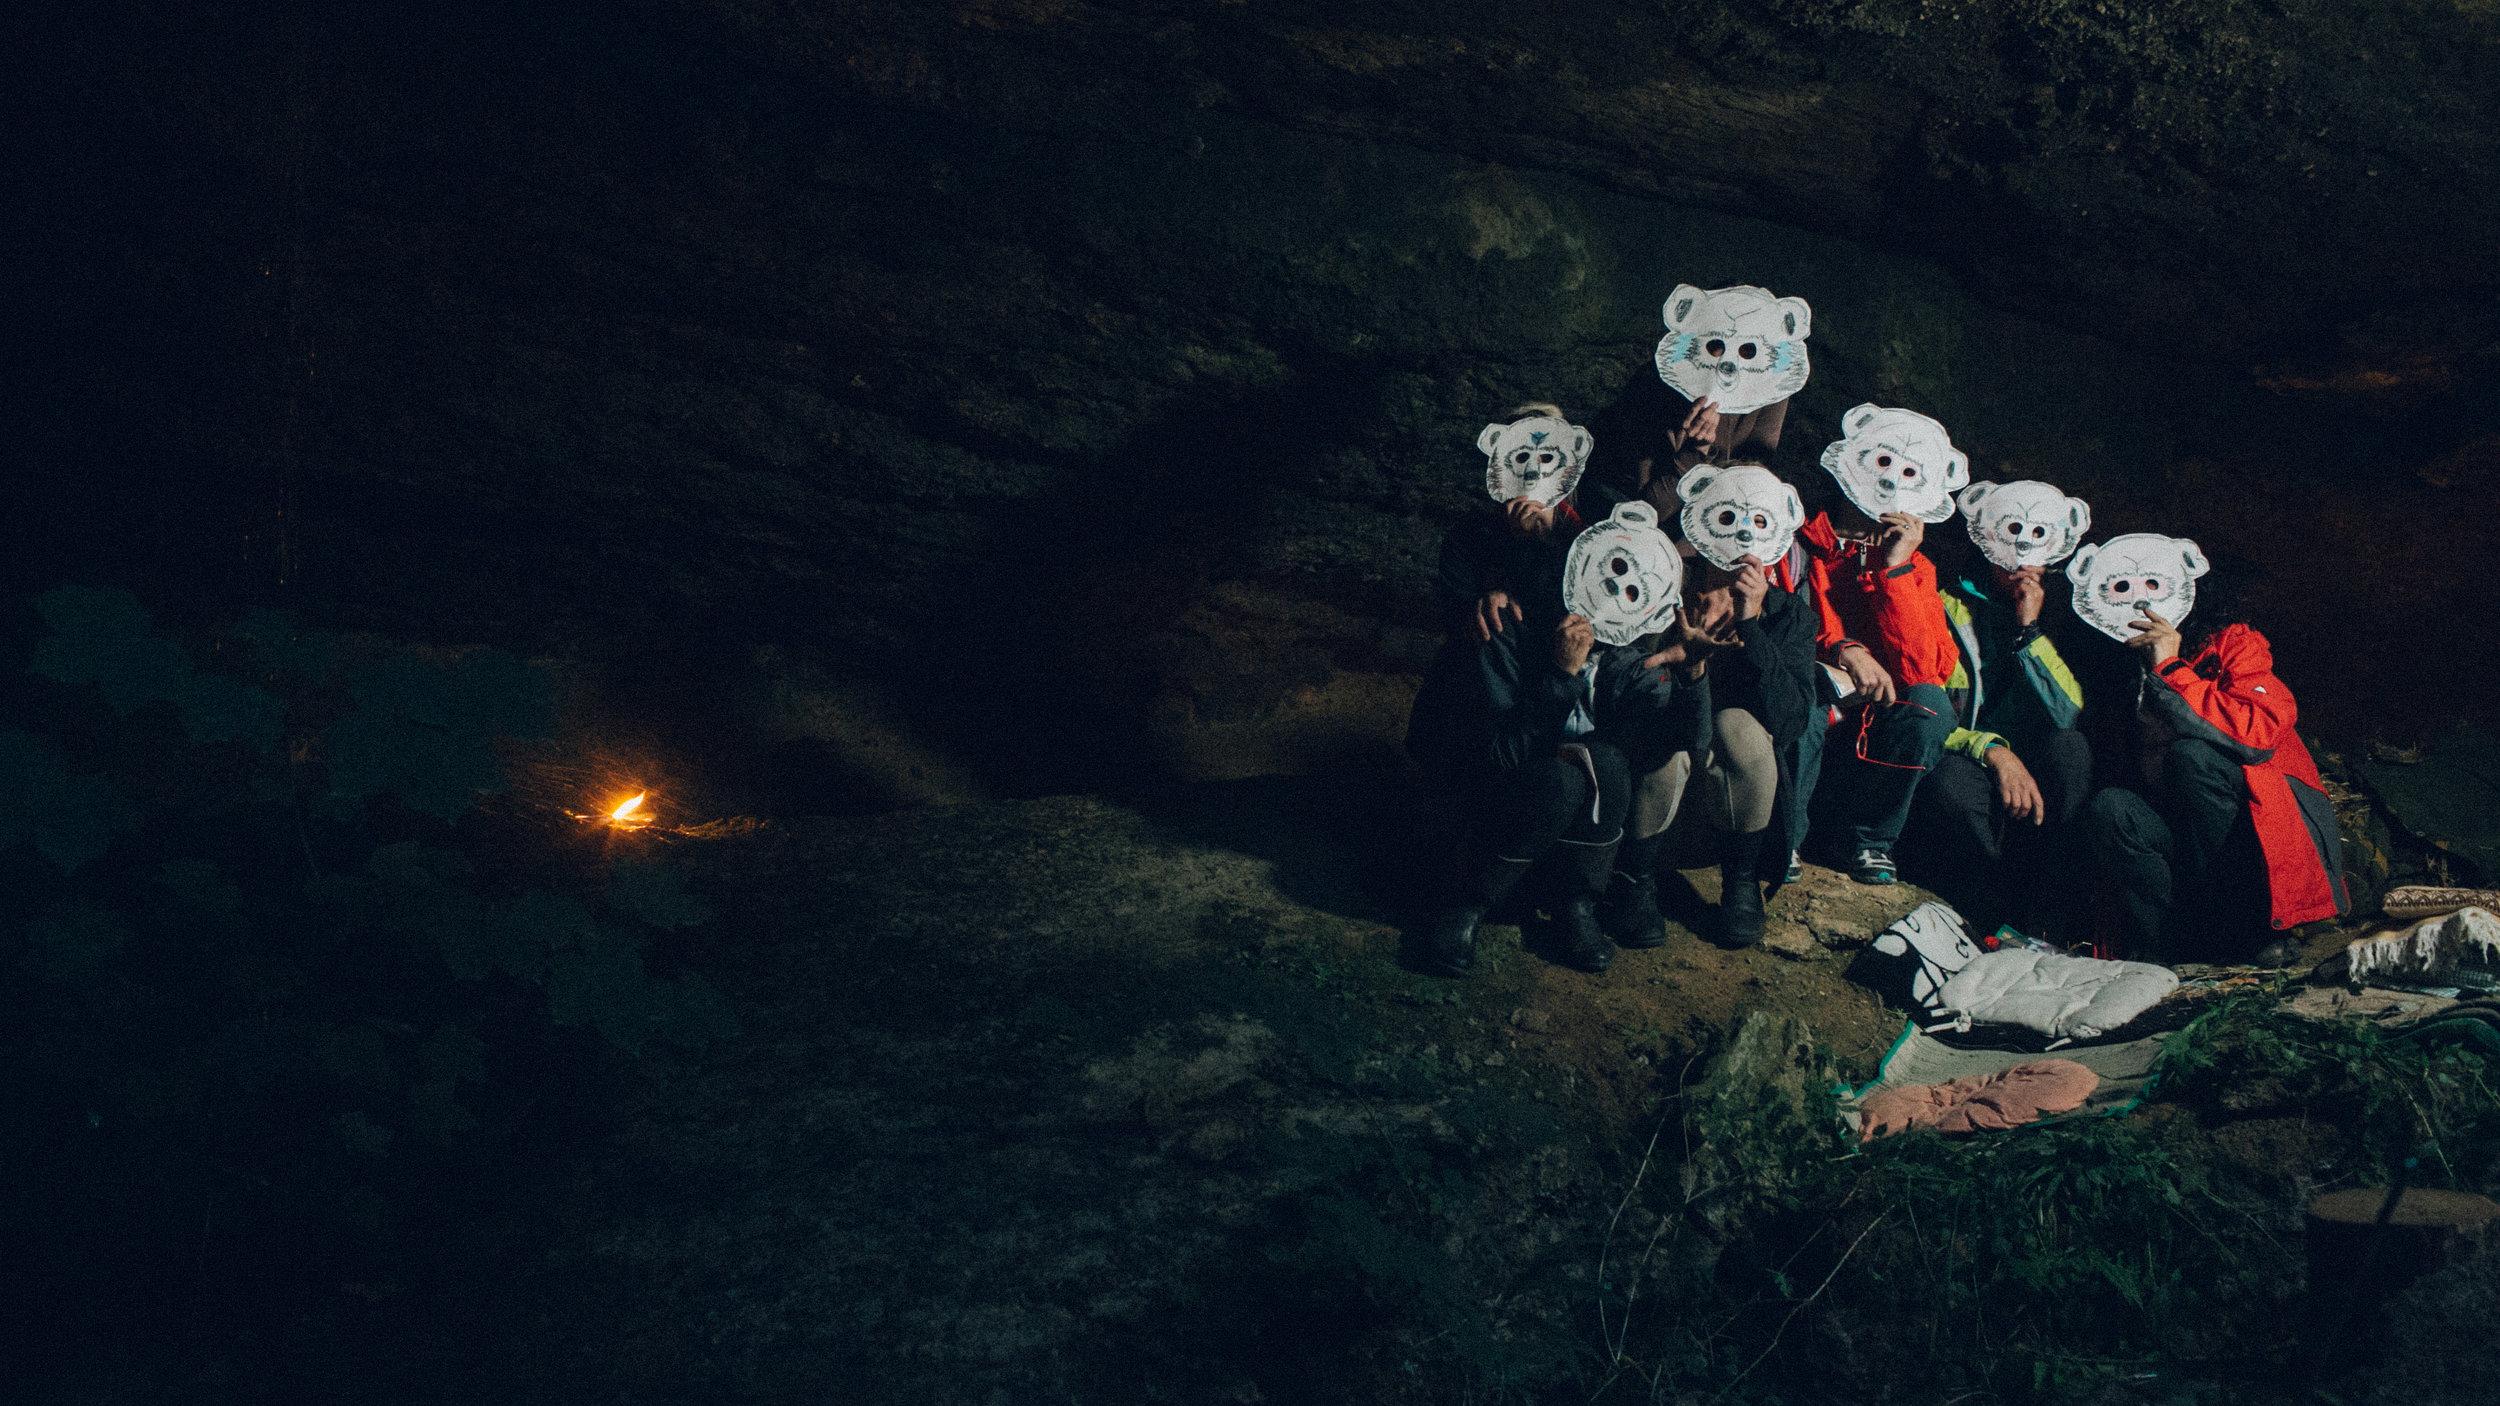 cave_kjazbec-1851.jpg